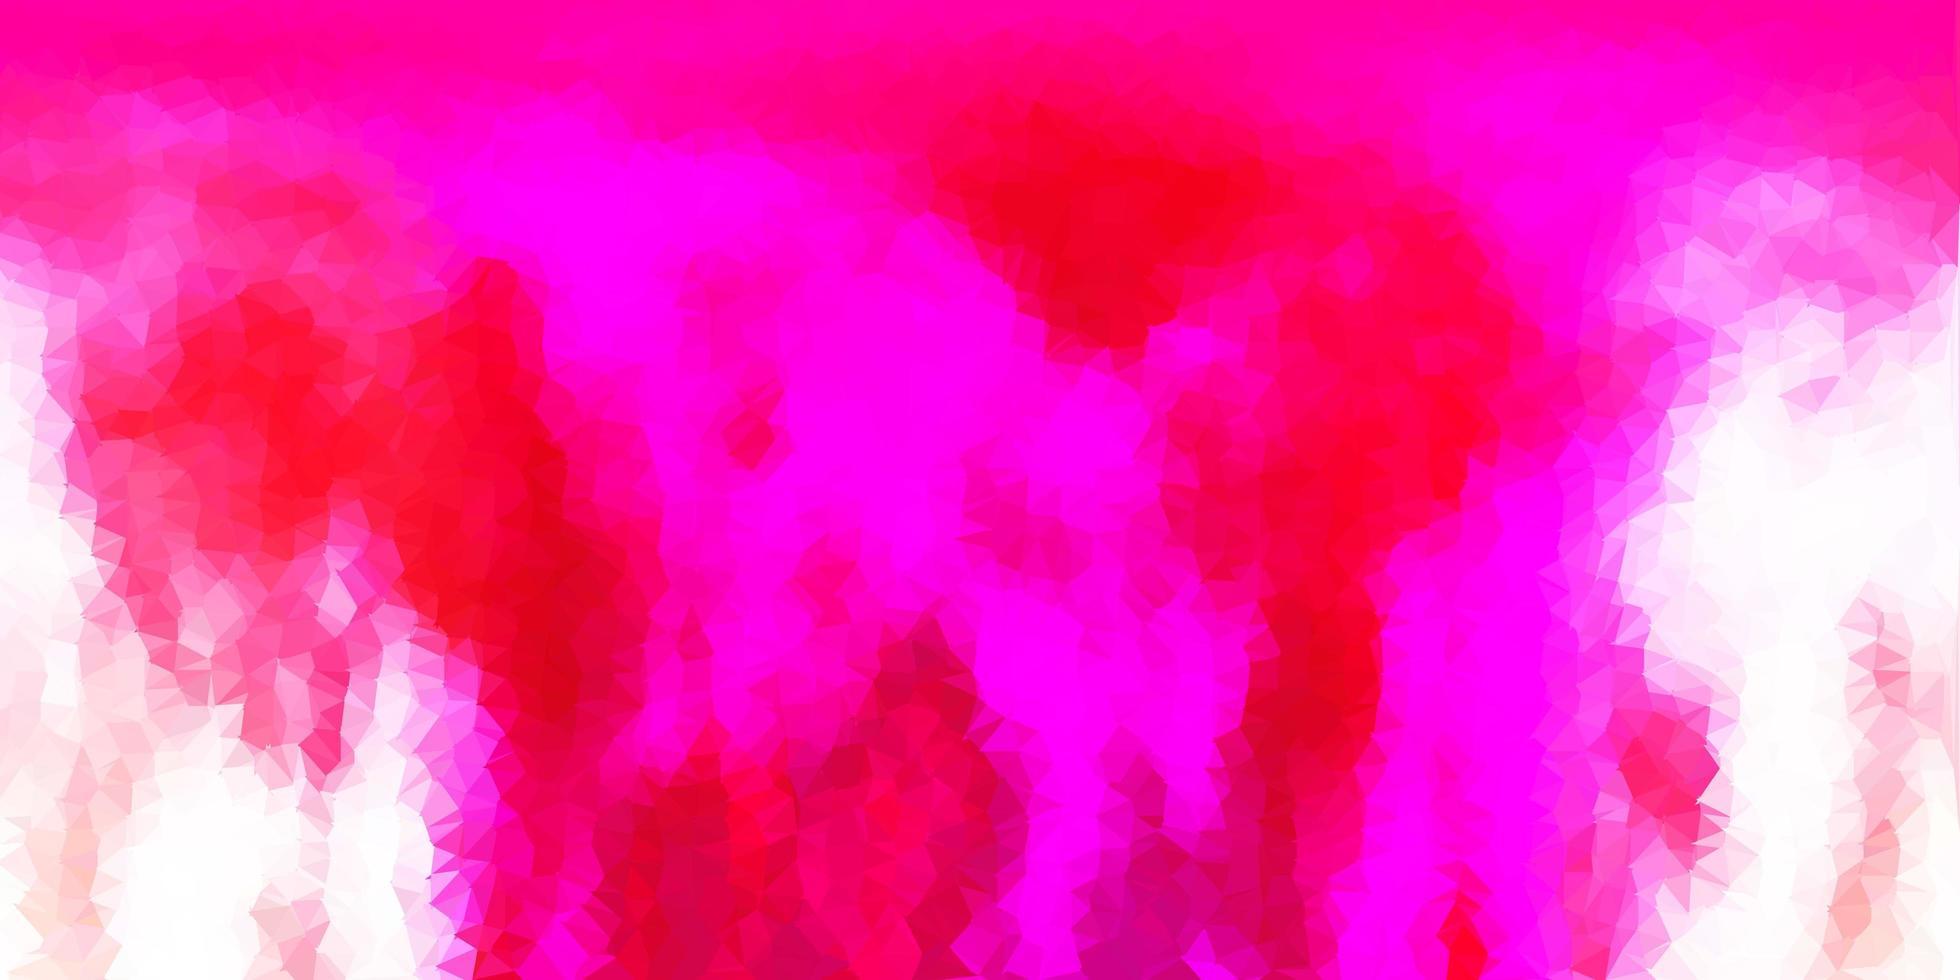 layout poligonal geométrico do vetor rosa claro.